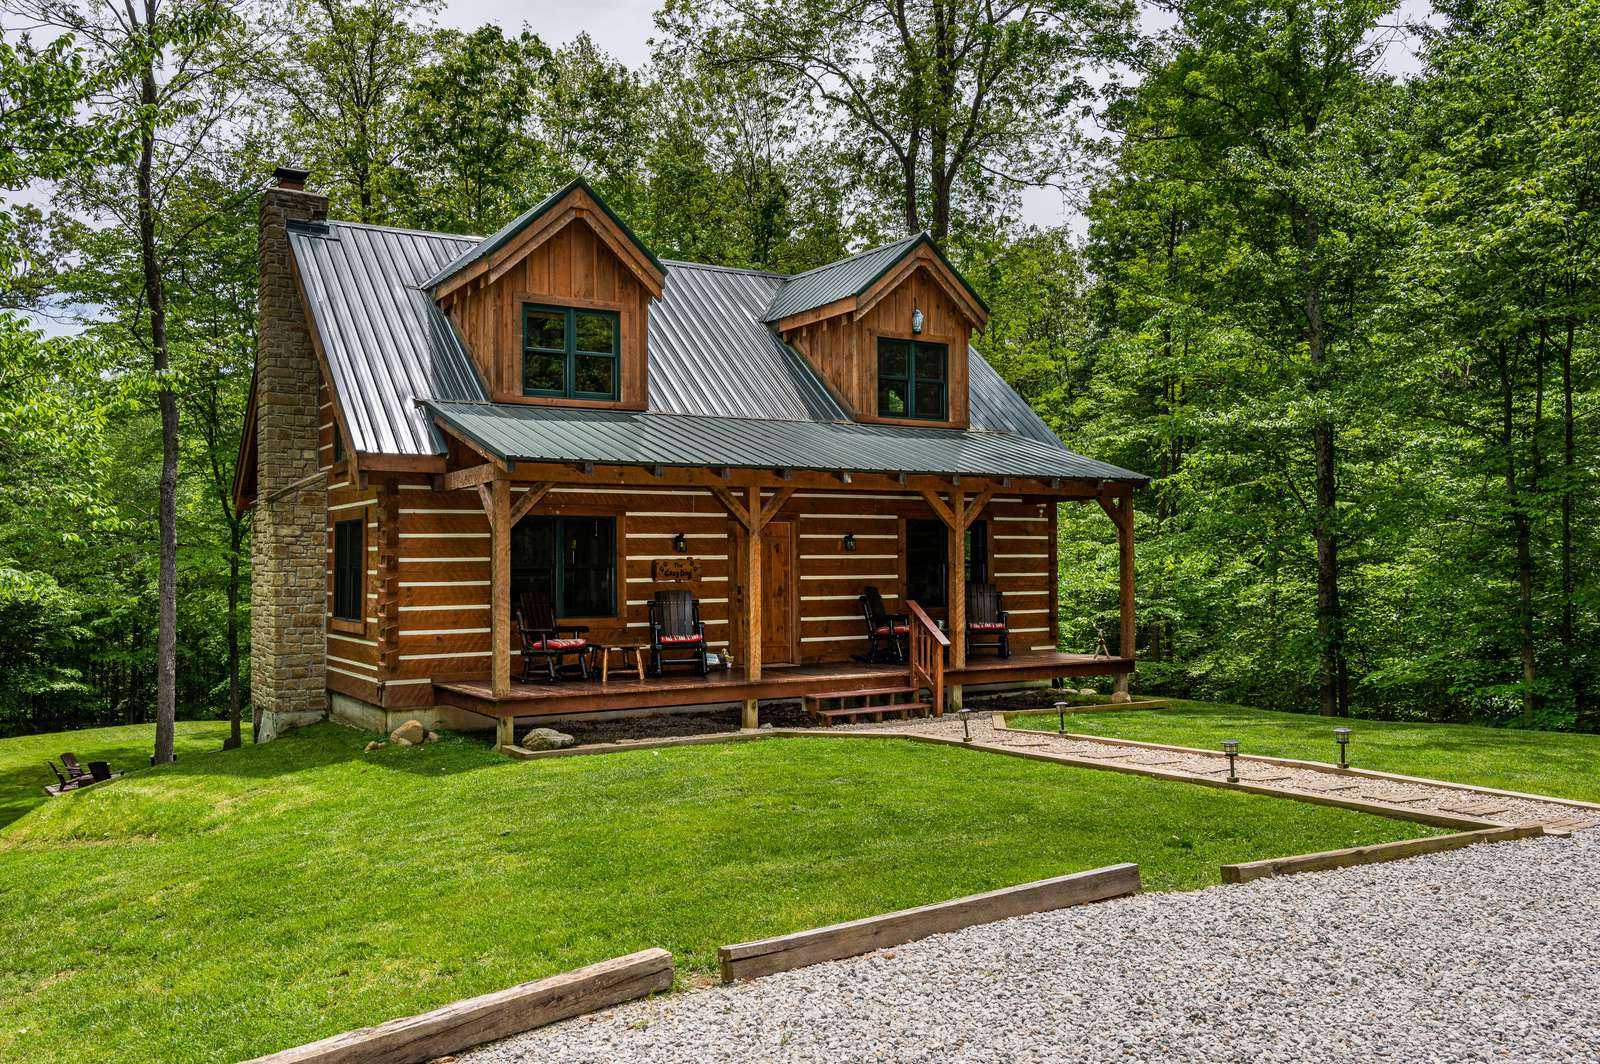 Cozy Dog Vacation Log Cabin - property